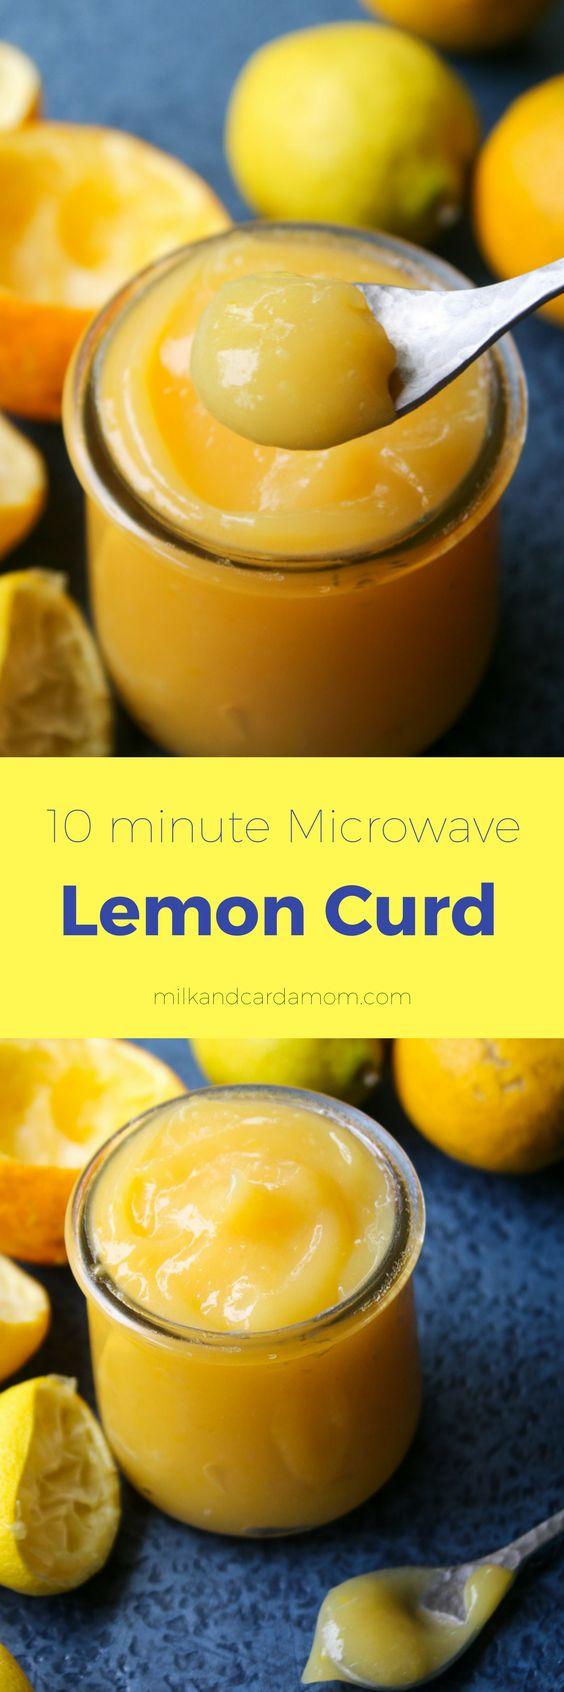 lemon curd, microwave lemon curd, lemon ,lemon recipe, recipe, dessert recipe, 10 minute dessert, no bake dessert, quick lemon curd recipe, vegetarian, citrus recipe, citrus dessert